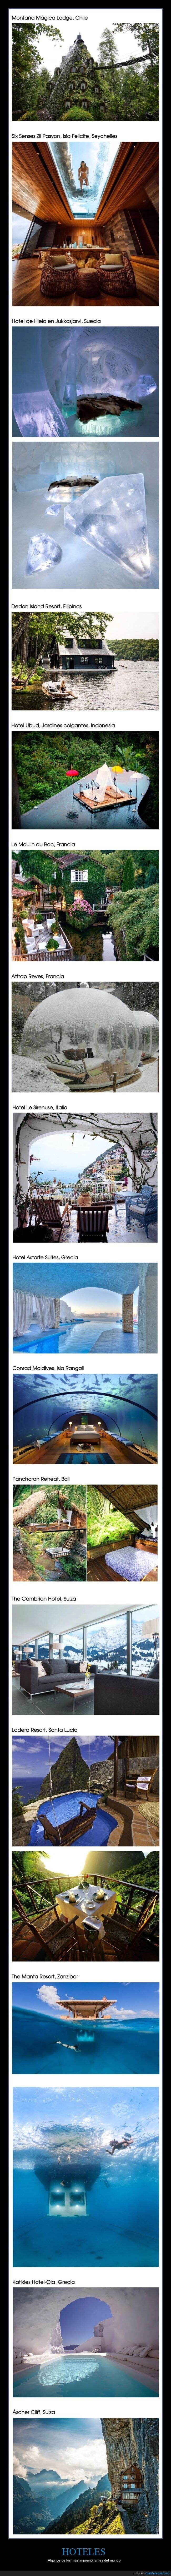 hoteles,impresionantes